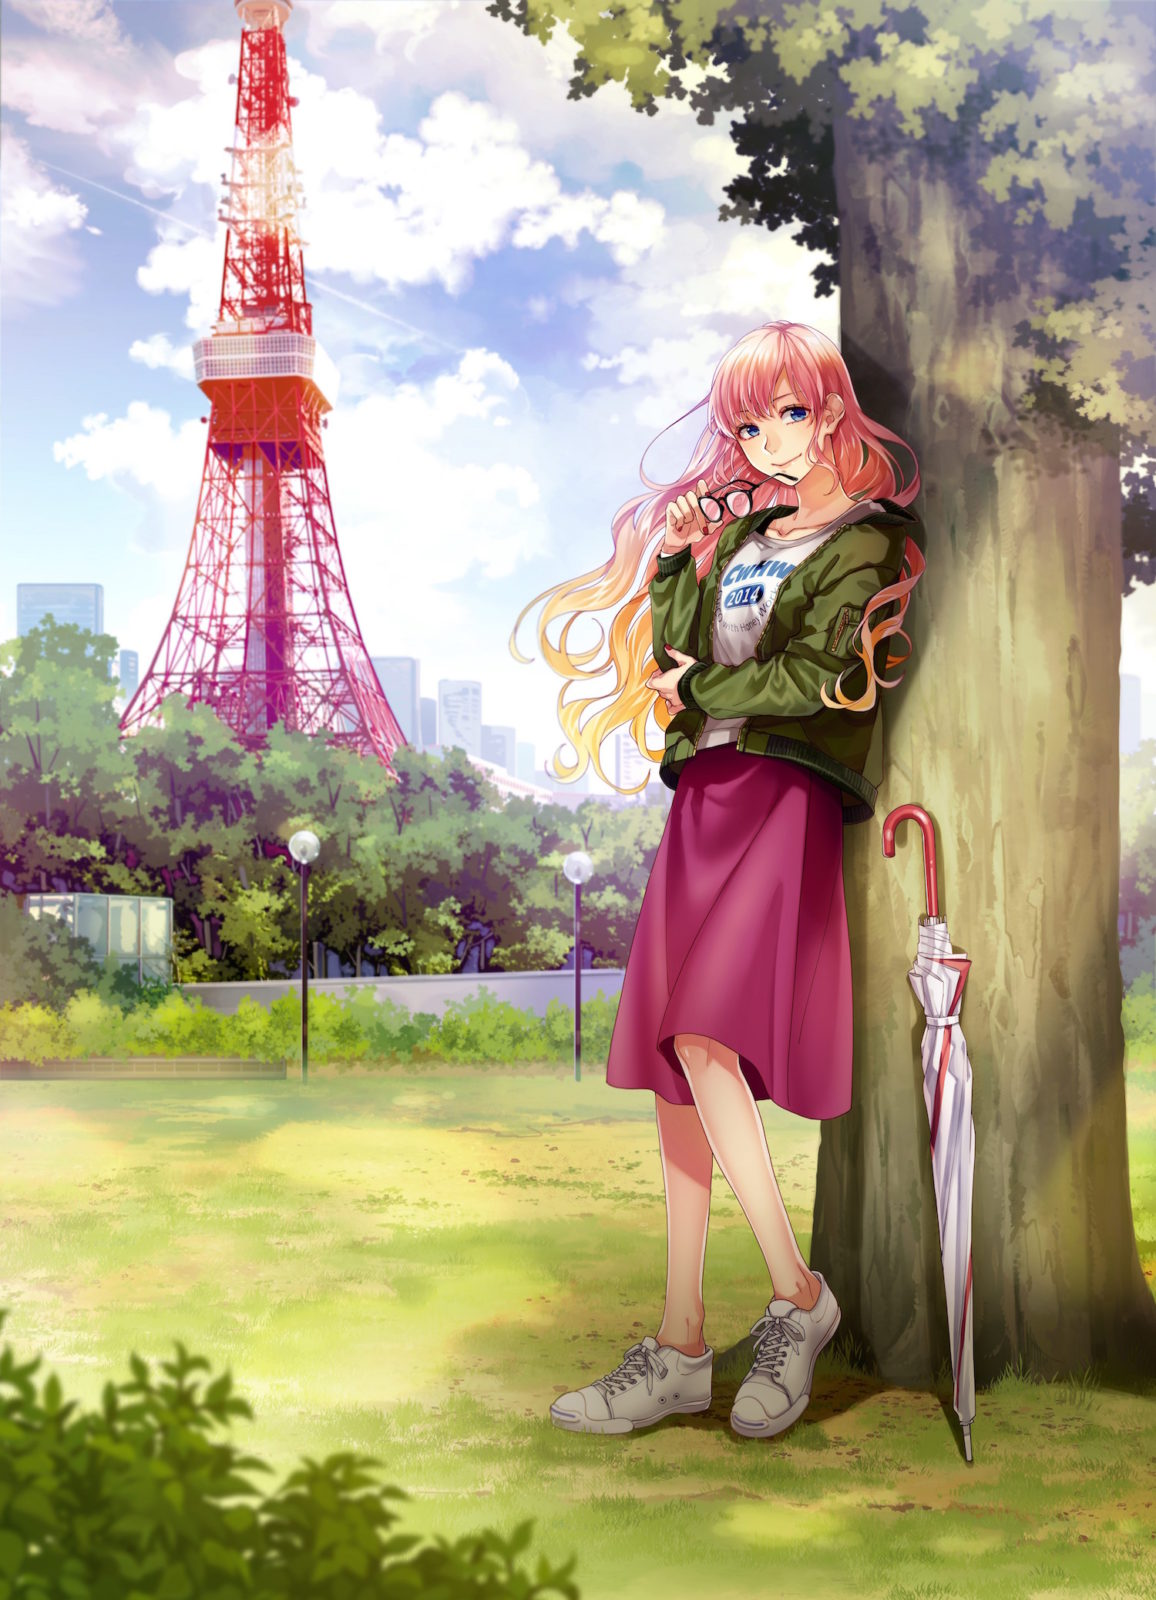 CHiCO with HoneyWorks 2年振りのセカンドフルアルバム「私を染めるiの歌」が2月28日に発売決定サムネイル画像